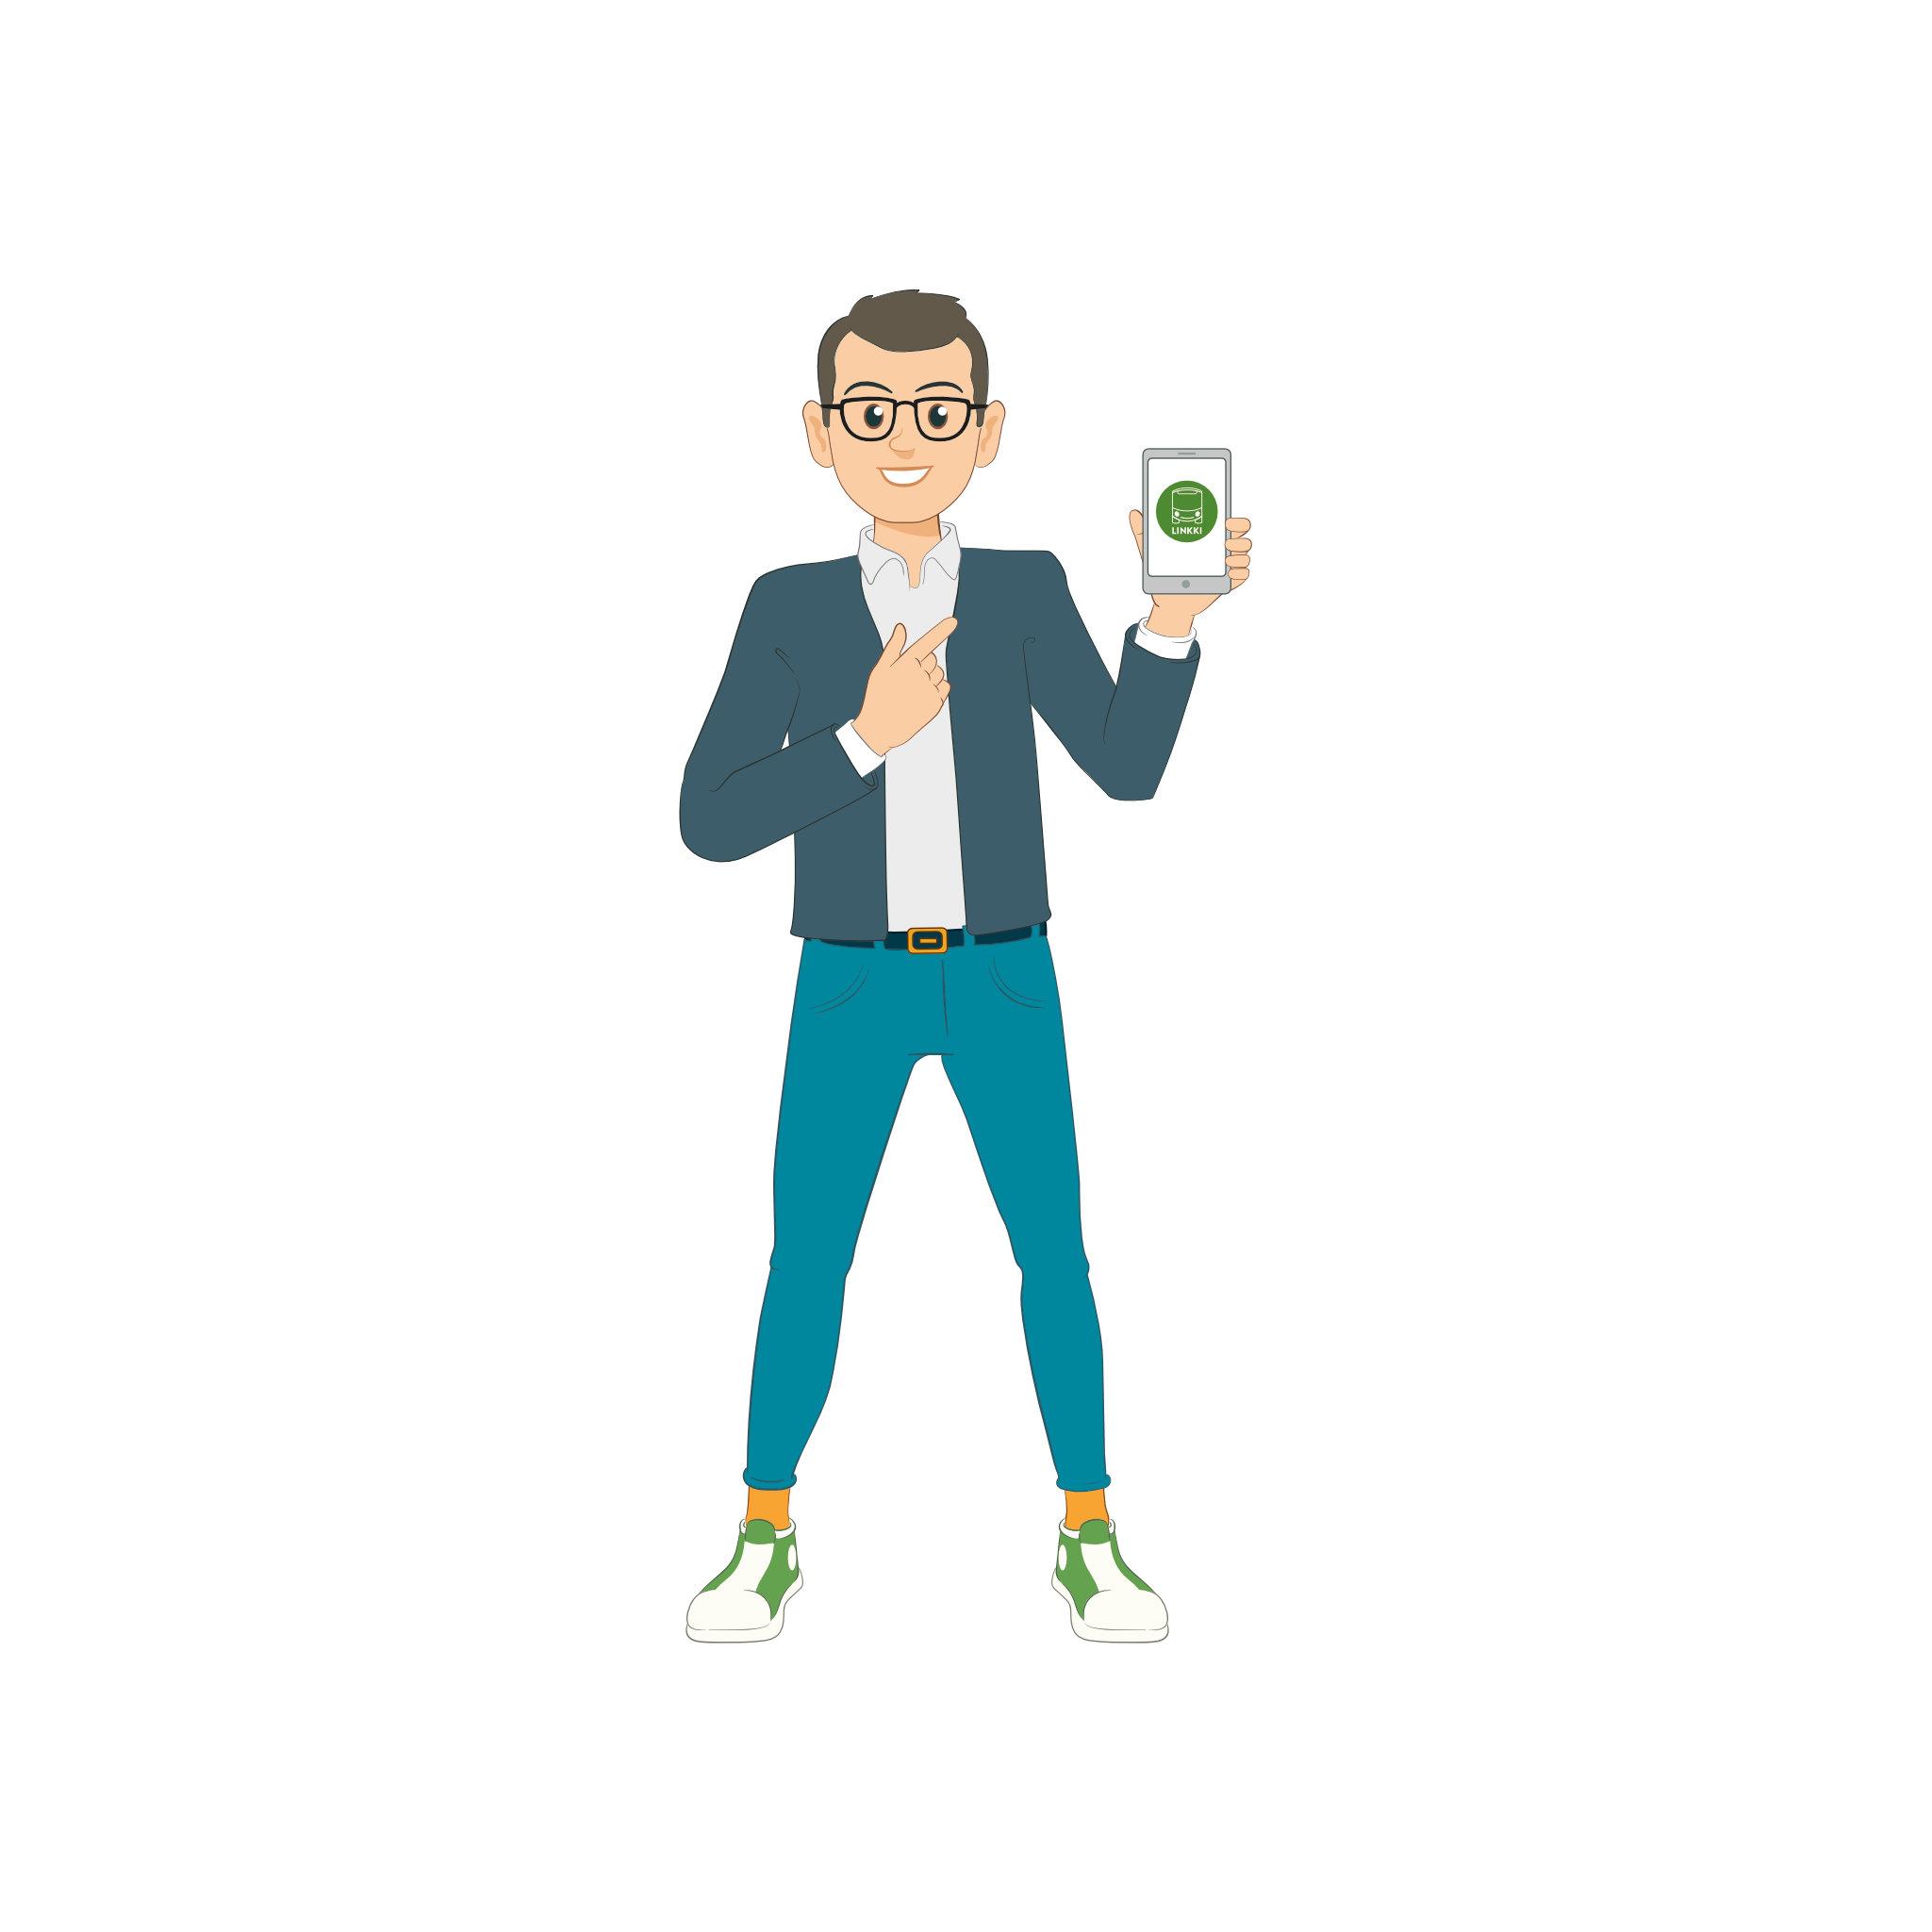 Linkki-matkustajia: Mies ja Linkki-mobiilisovellus